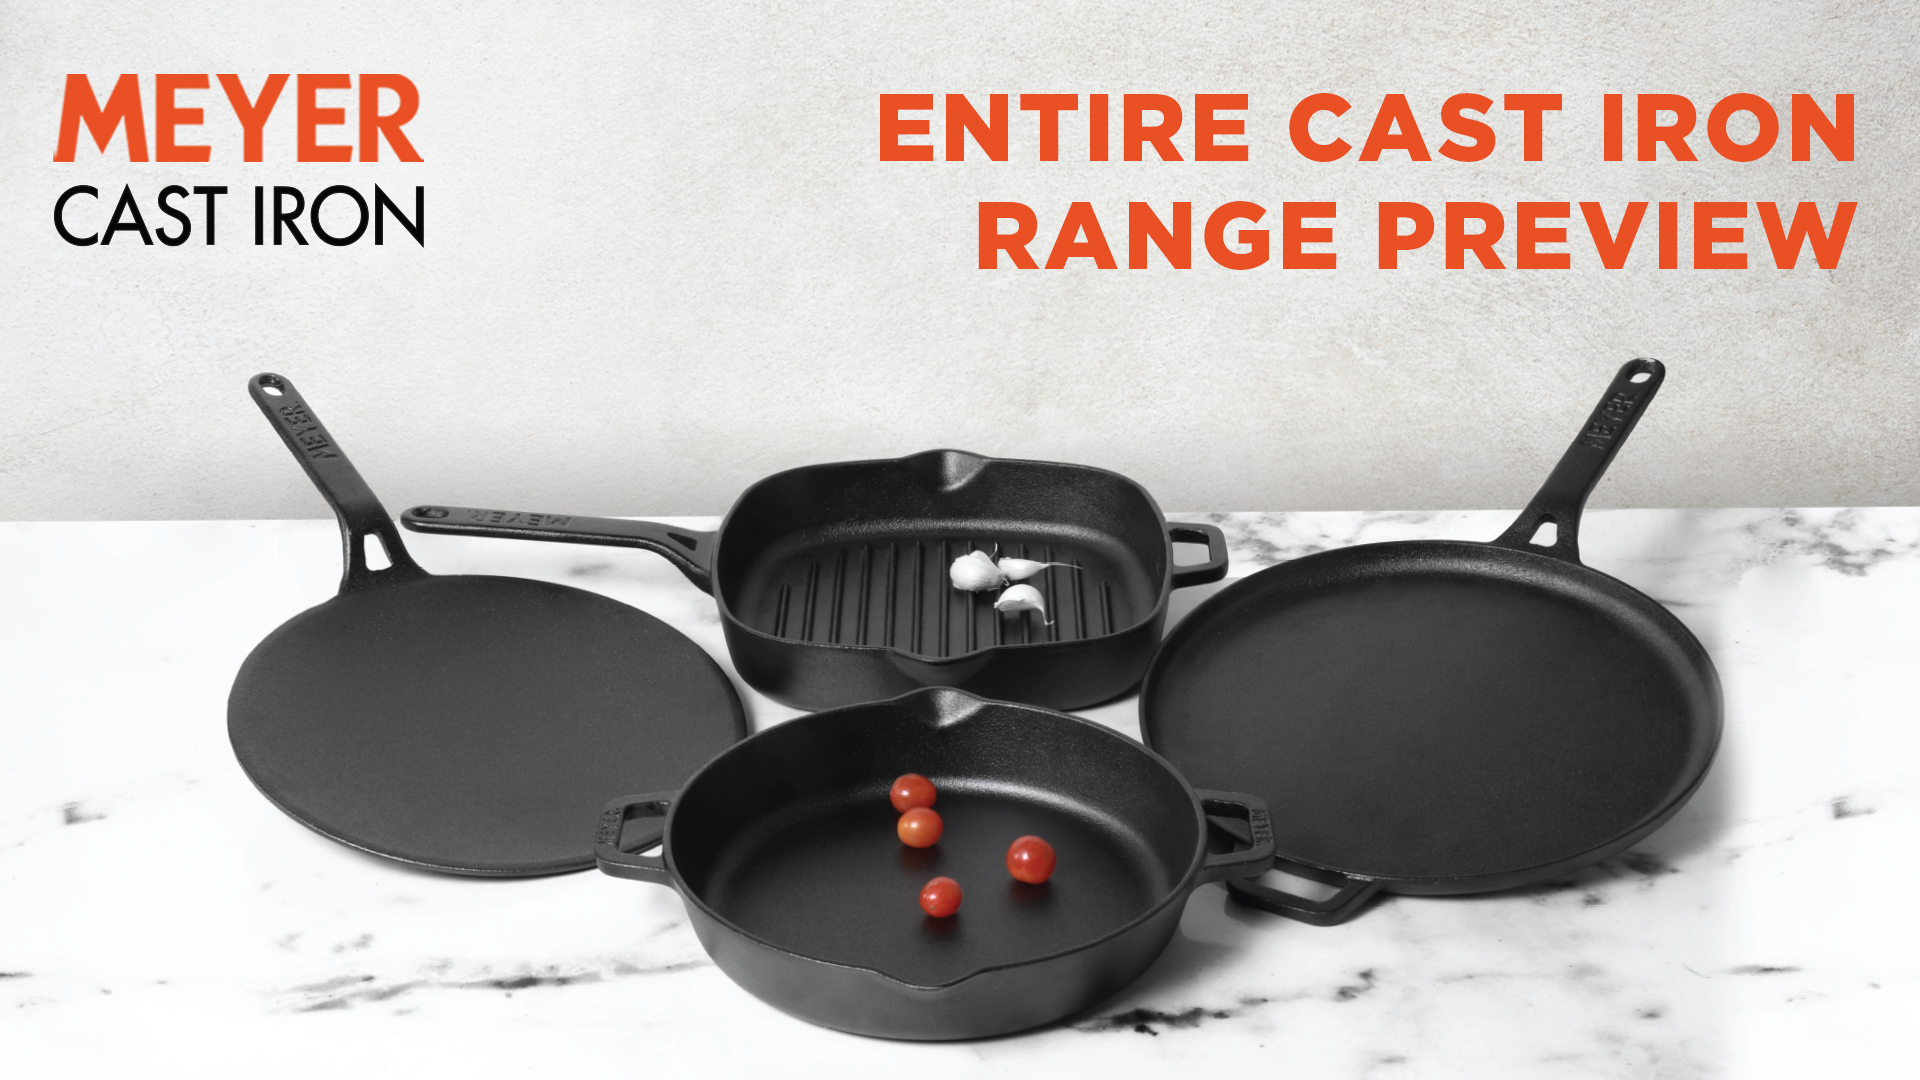 Meyer-Induction-Base-Cast-Iron-Frying-Pan-20cm-Black-1-Piece